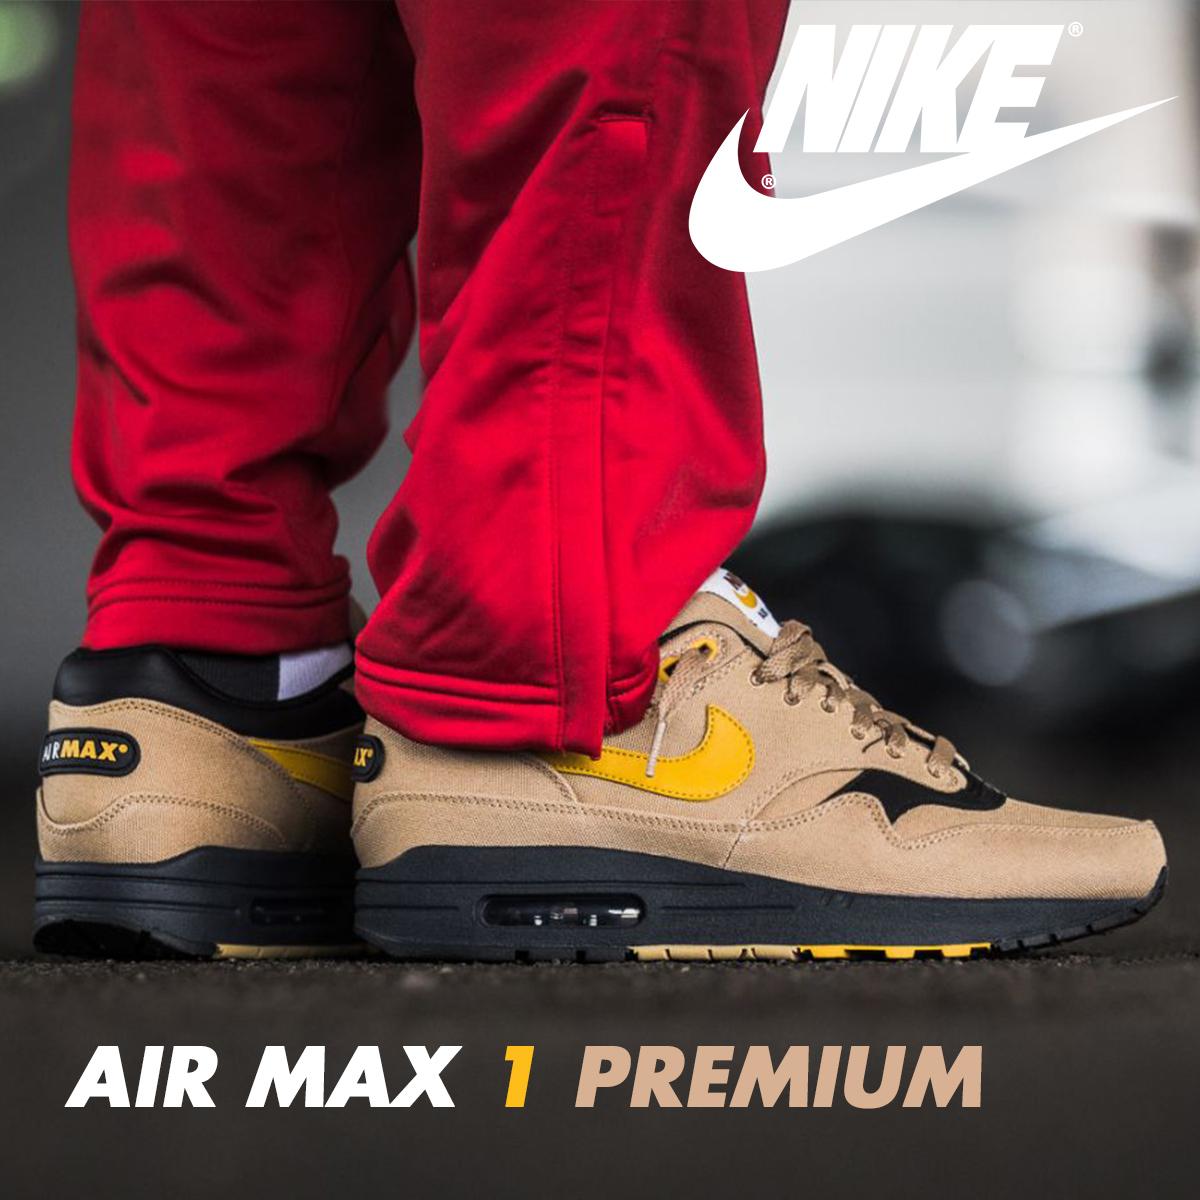 ALLSPORTS: NIKE AIR MAX 1 PREMIUM Kie Ney AMAX 1 sneakers